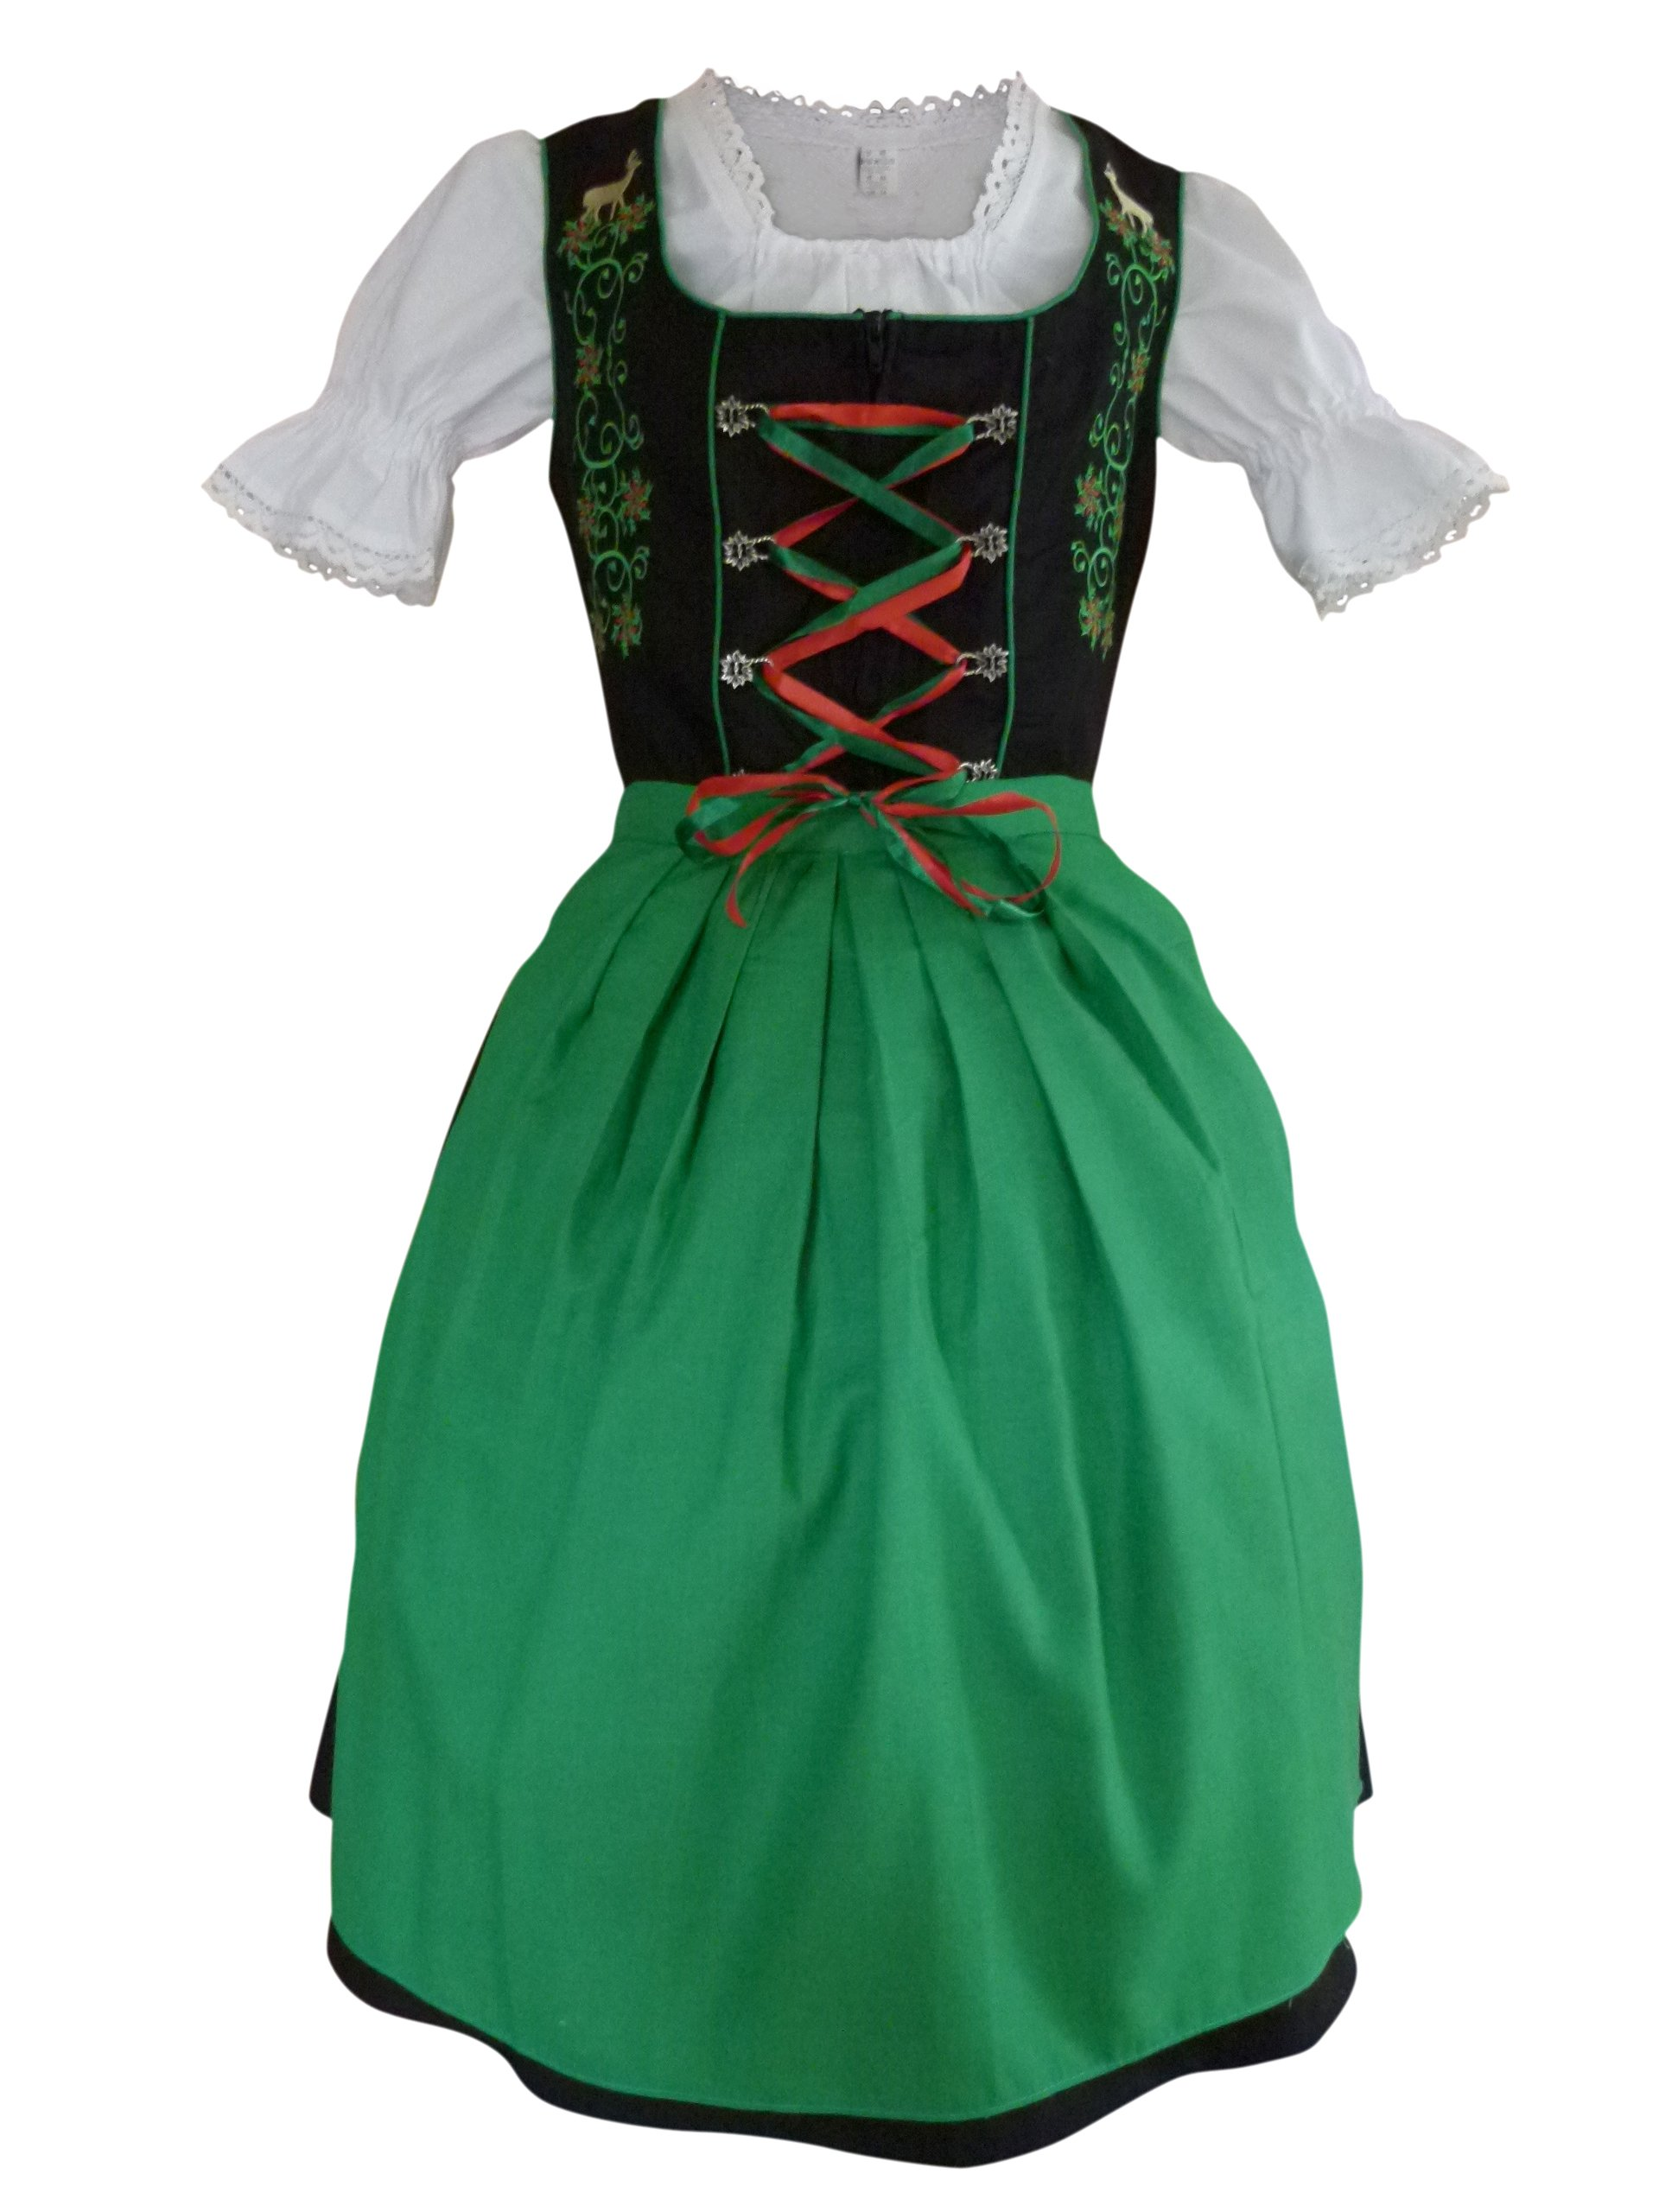 Dirndl World Womens Di24, German Bavarian 3 Piece Mini Dirndl Dress for Oktoberfest, Blouse, Apron, Size 8